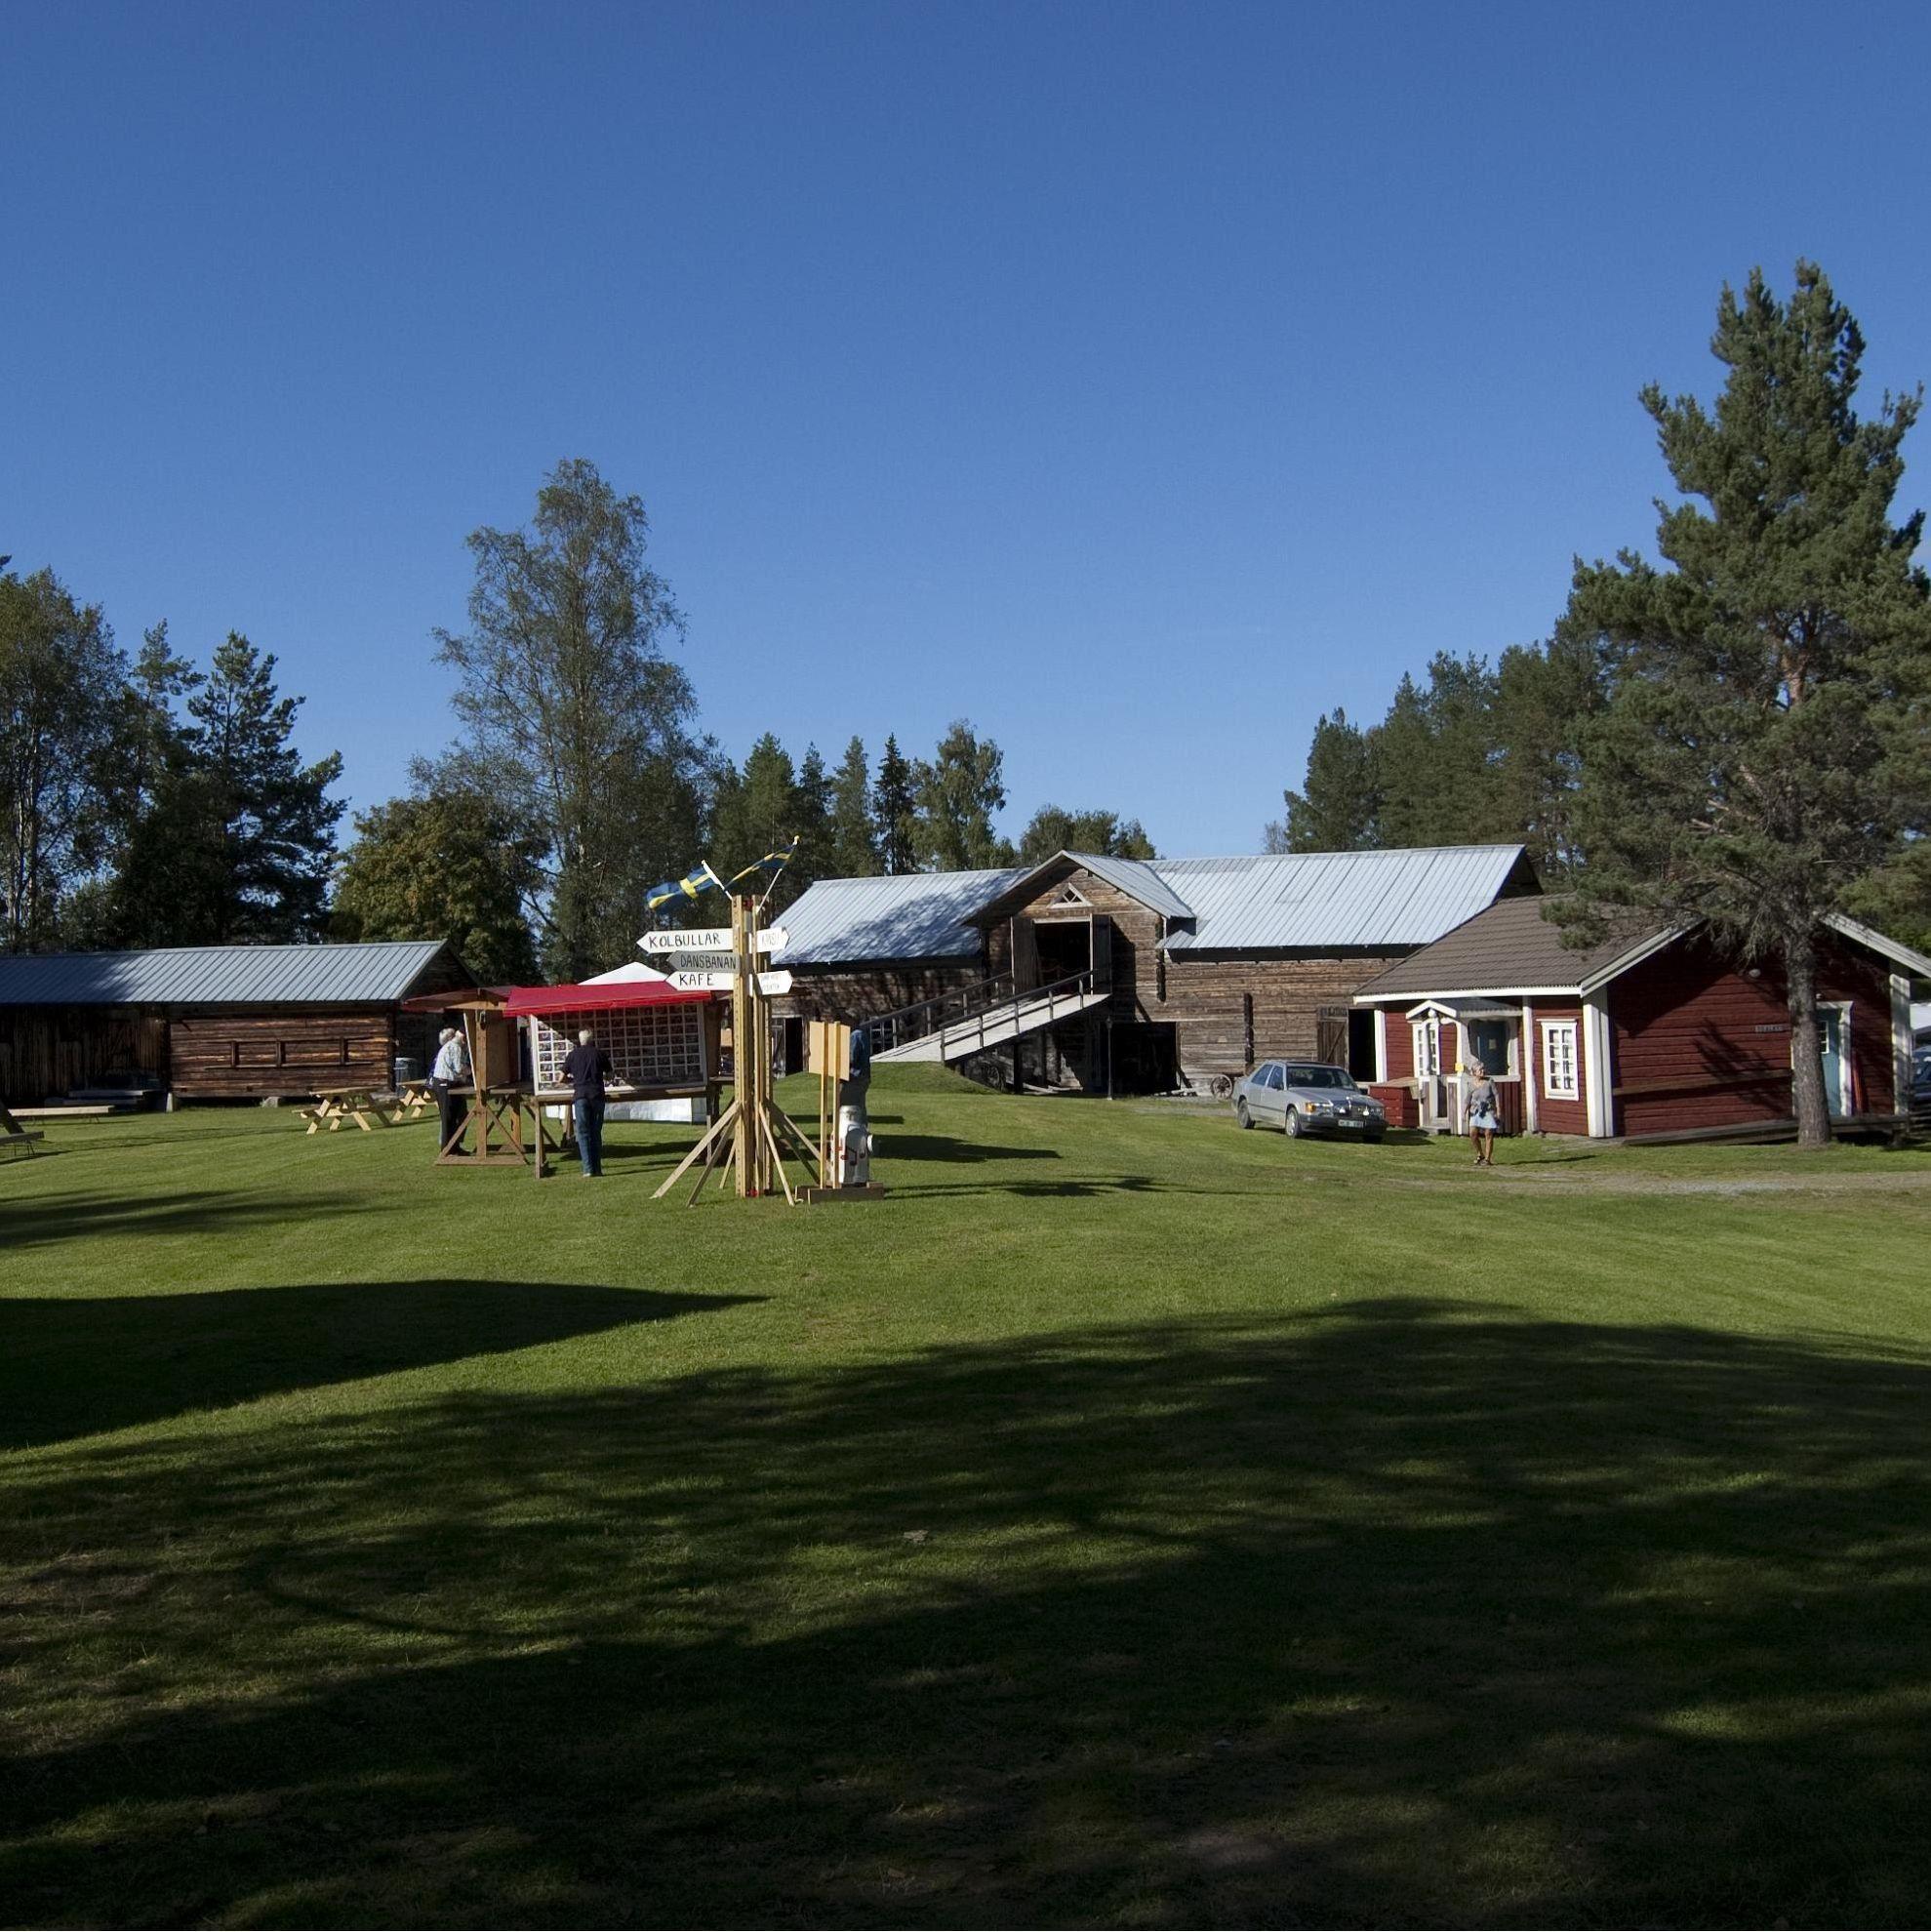 Hembygdsgården i Ramsele